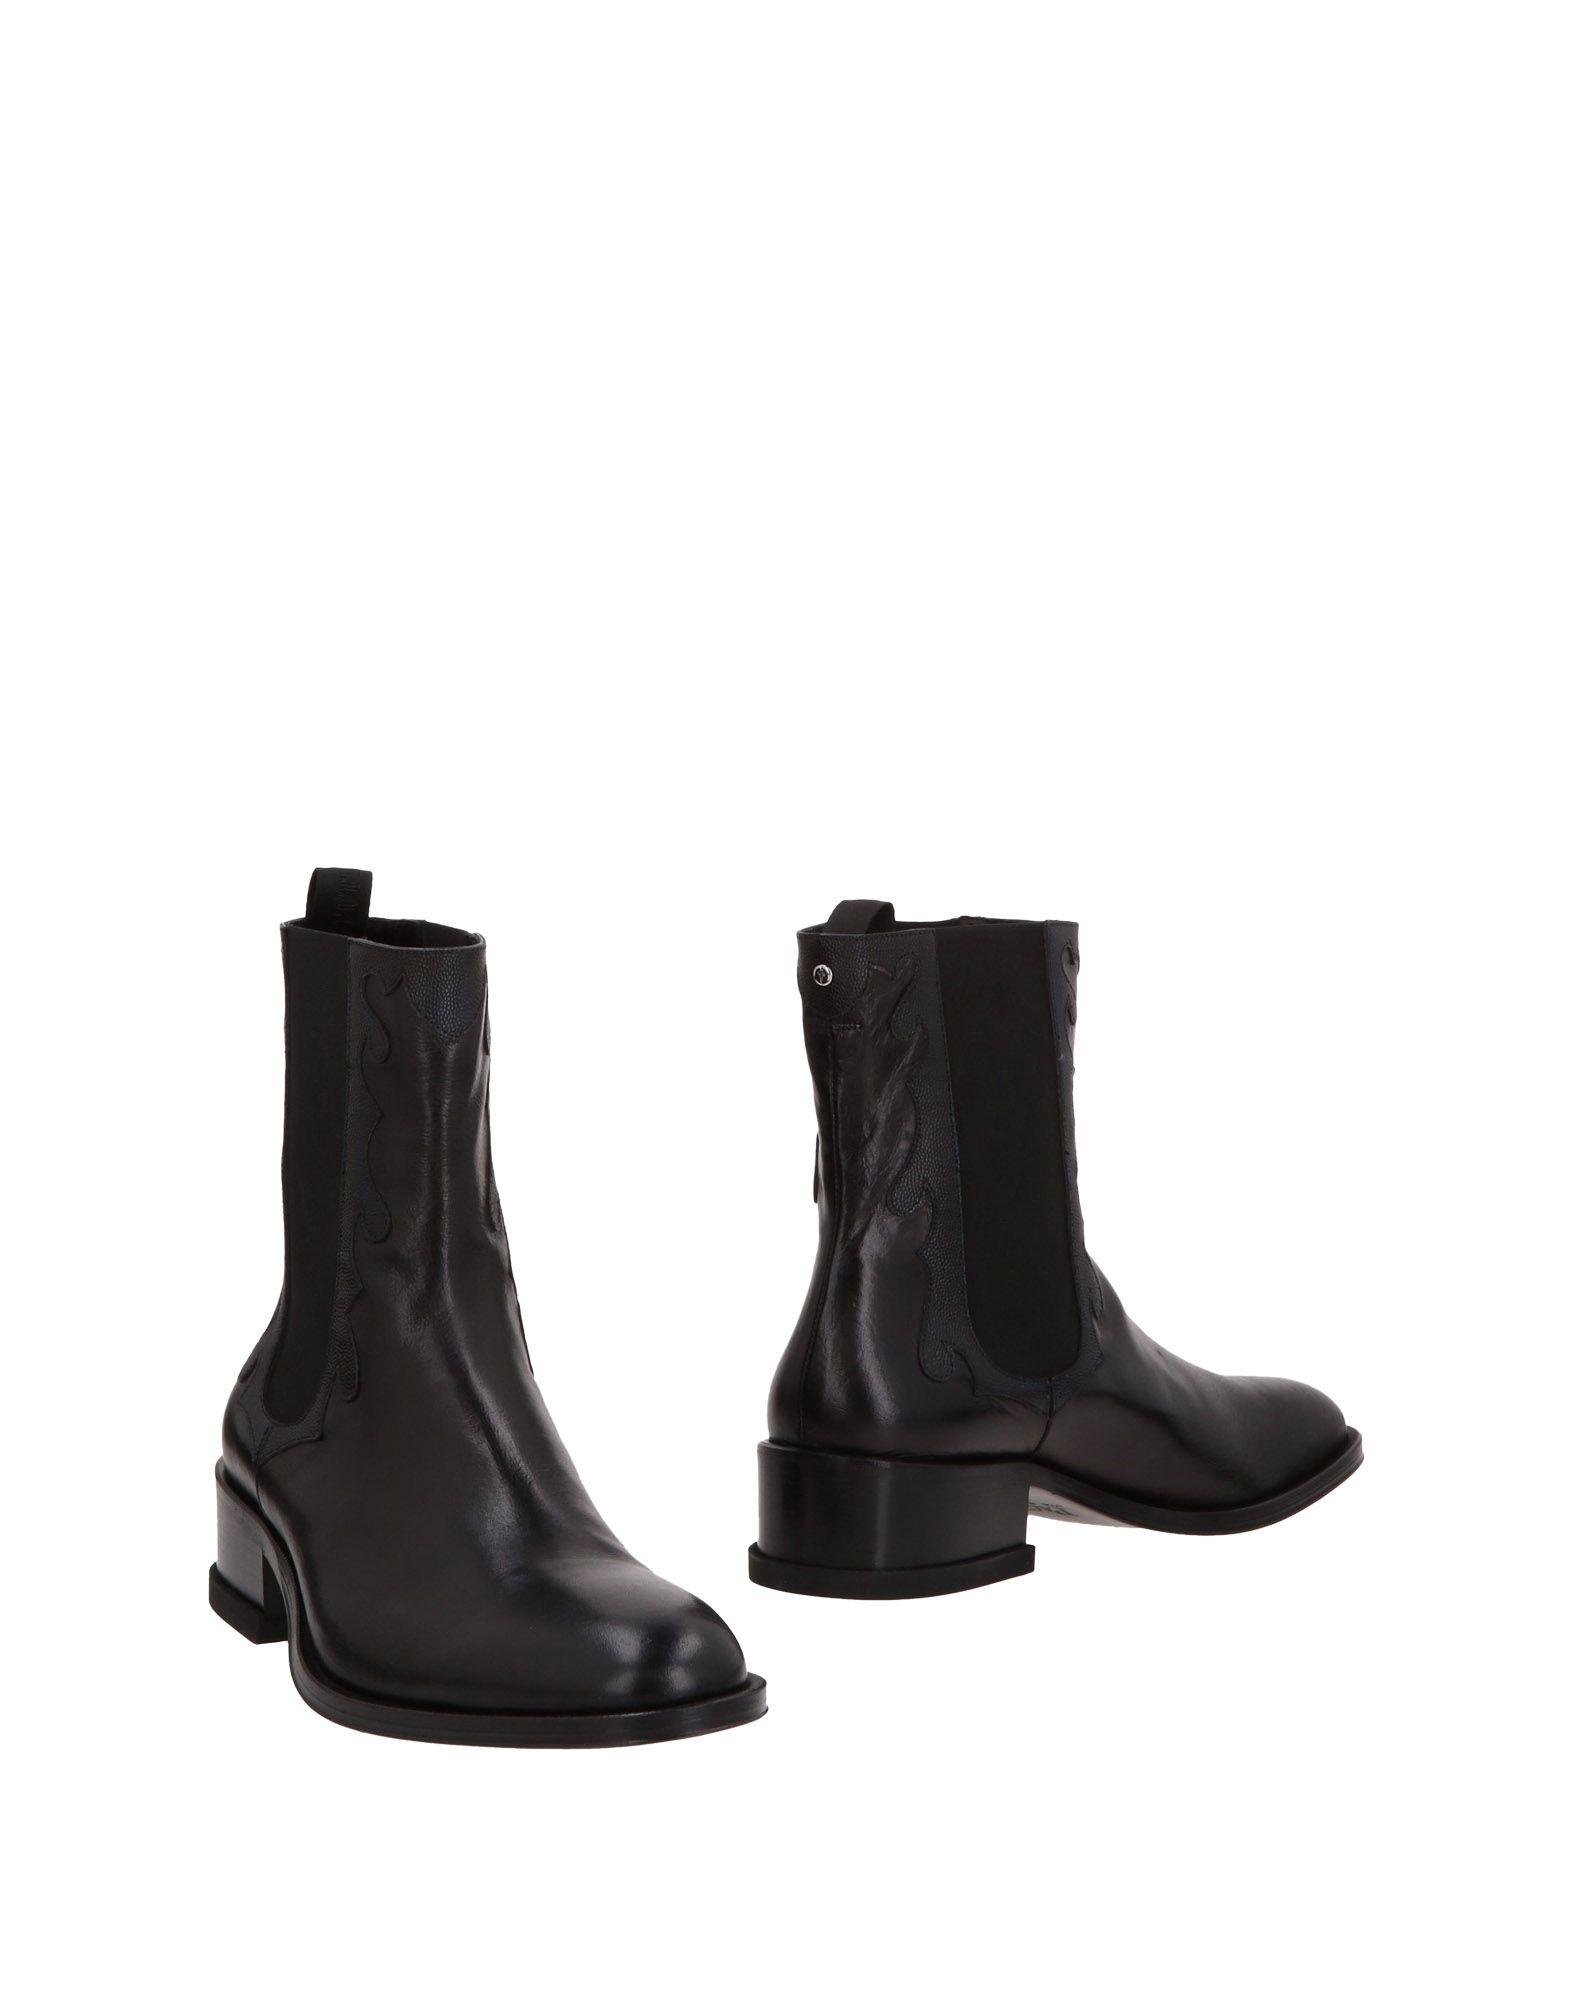 Cesare Paciotti Stiefelette Qualität Herren  11473184LH Gute Qualität Stiefelette beliebte Schuhe eefcf9